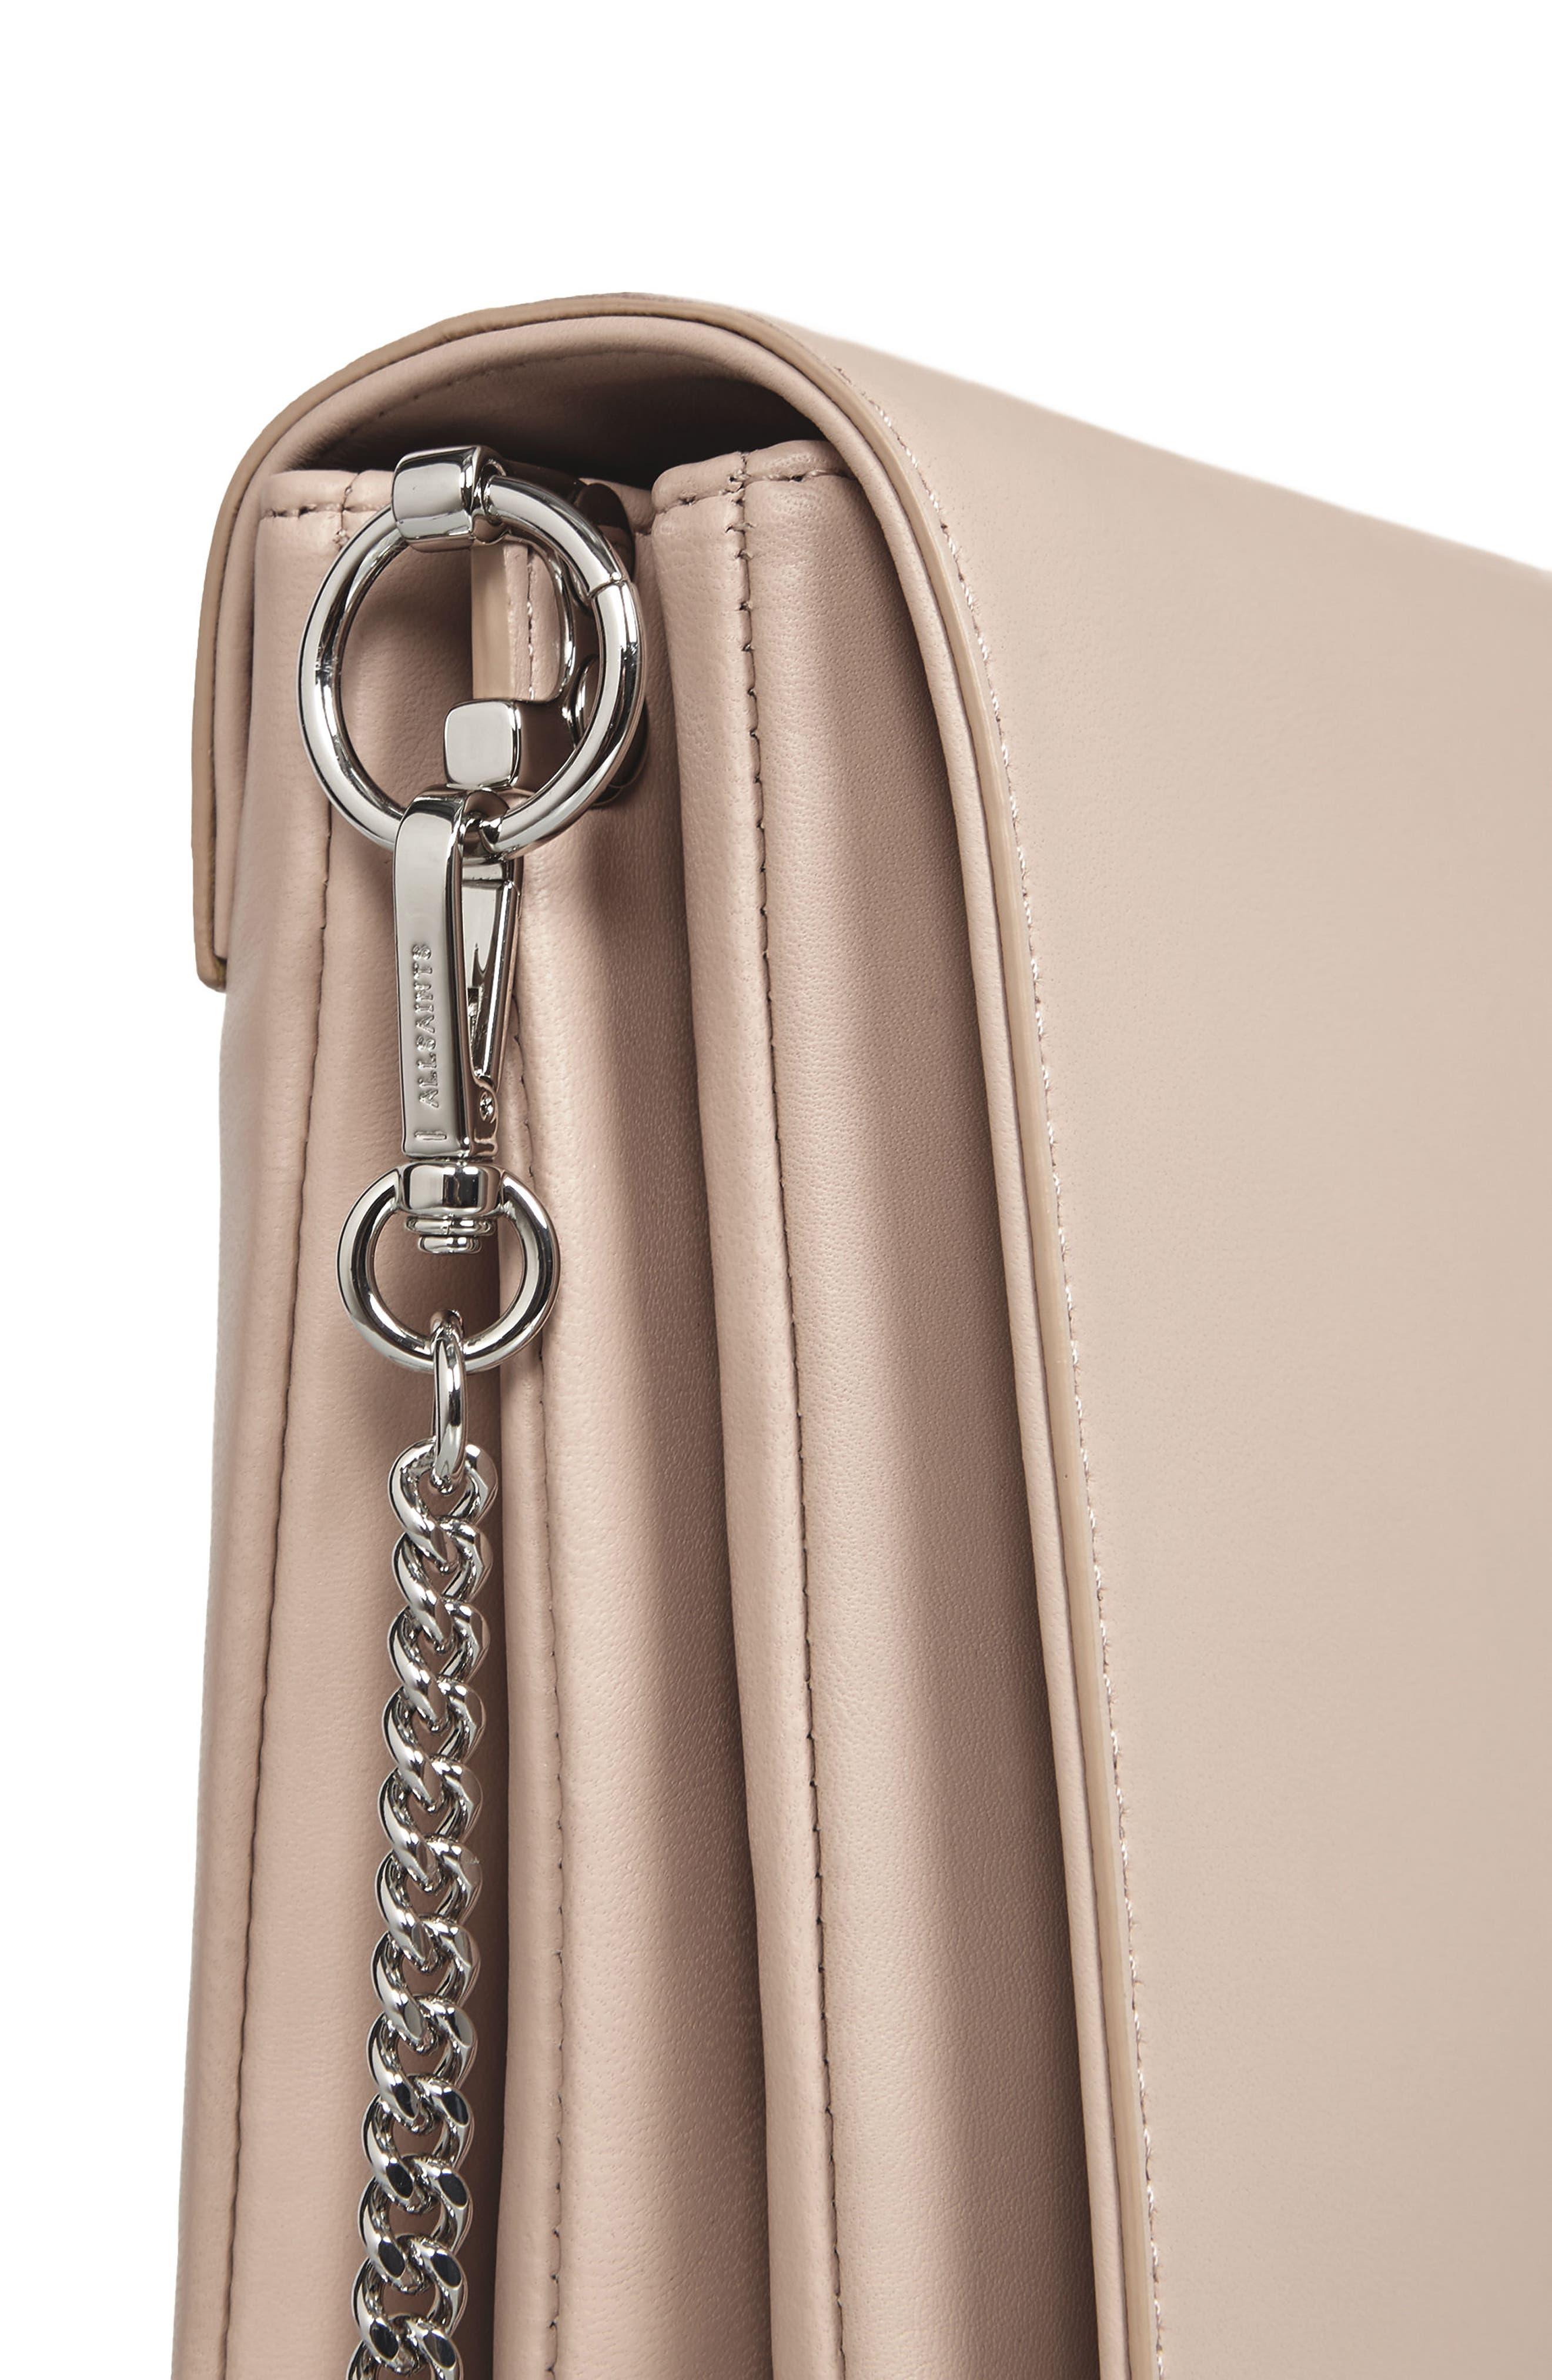 Zep Lambskin Leather Box Bag,                             Alternate thumbnail 5, color,                             Natural